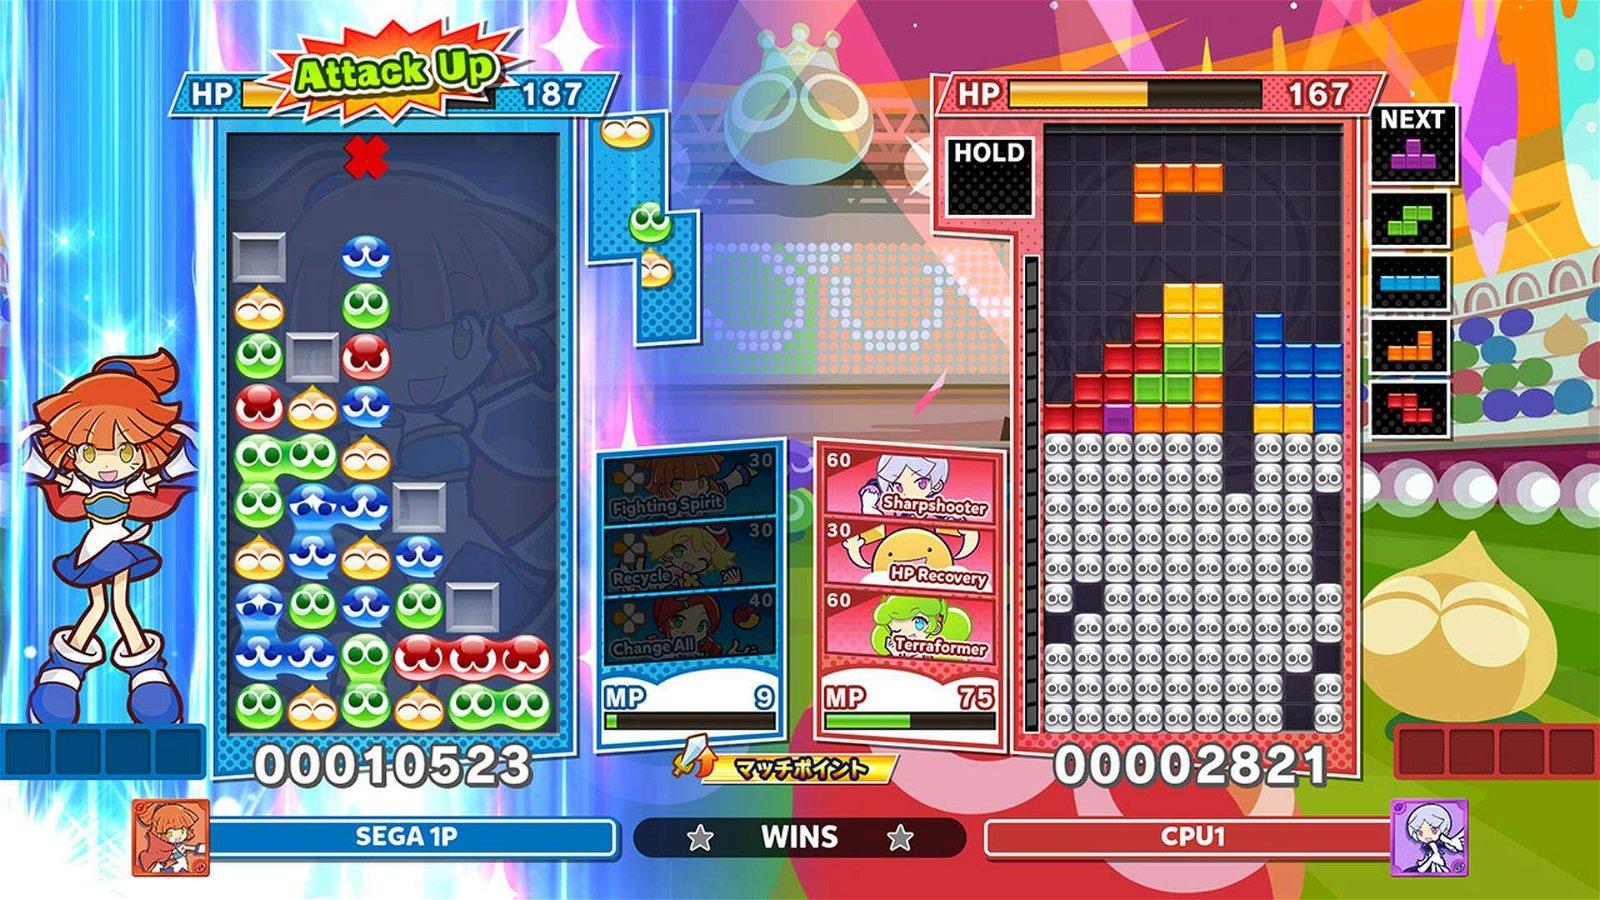 SEGA Announces Adventure Mode for Puyo Puyo Tetris 2 1